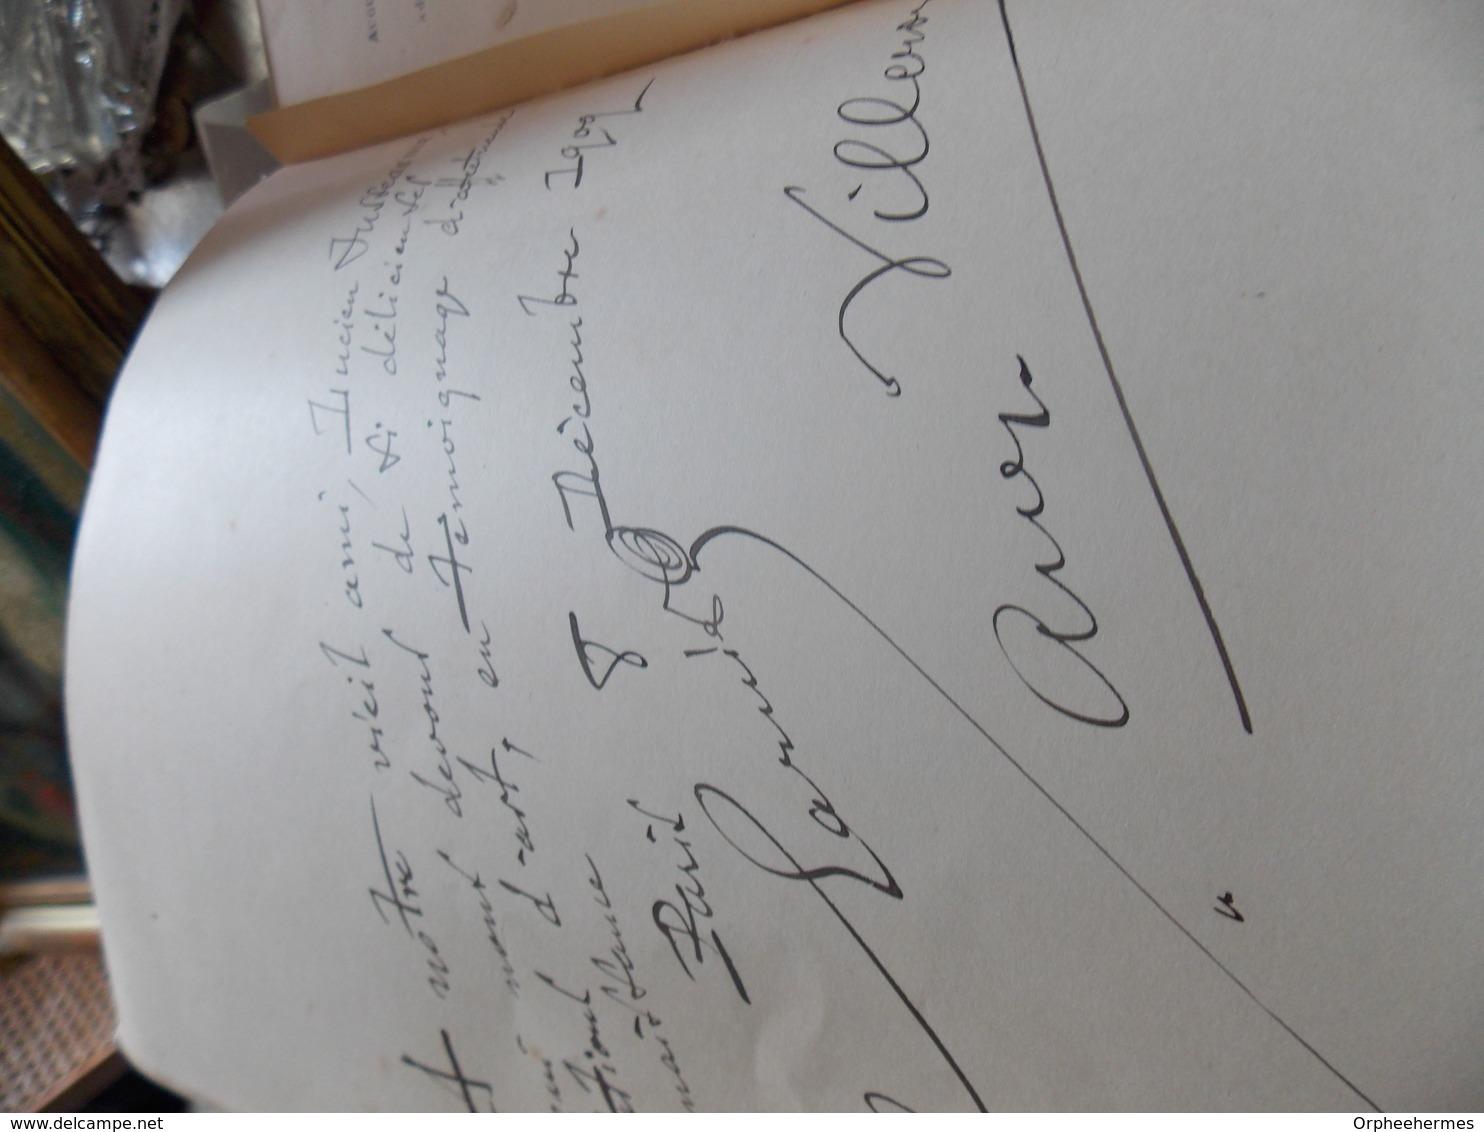 Partition Complète, Myrtil, Conte Musical En Deux Parties, Garnier, Ernest.EDITION ORIGINALE DEDICACEE.SIGNEE - Opern